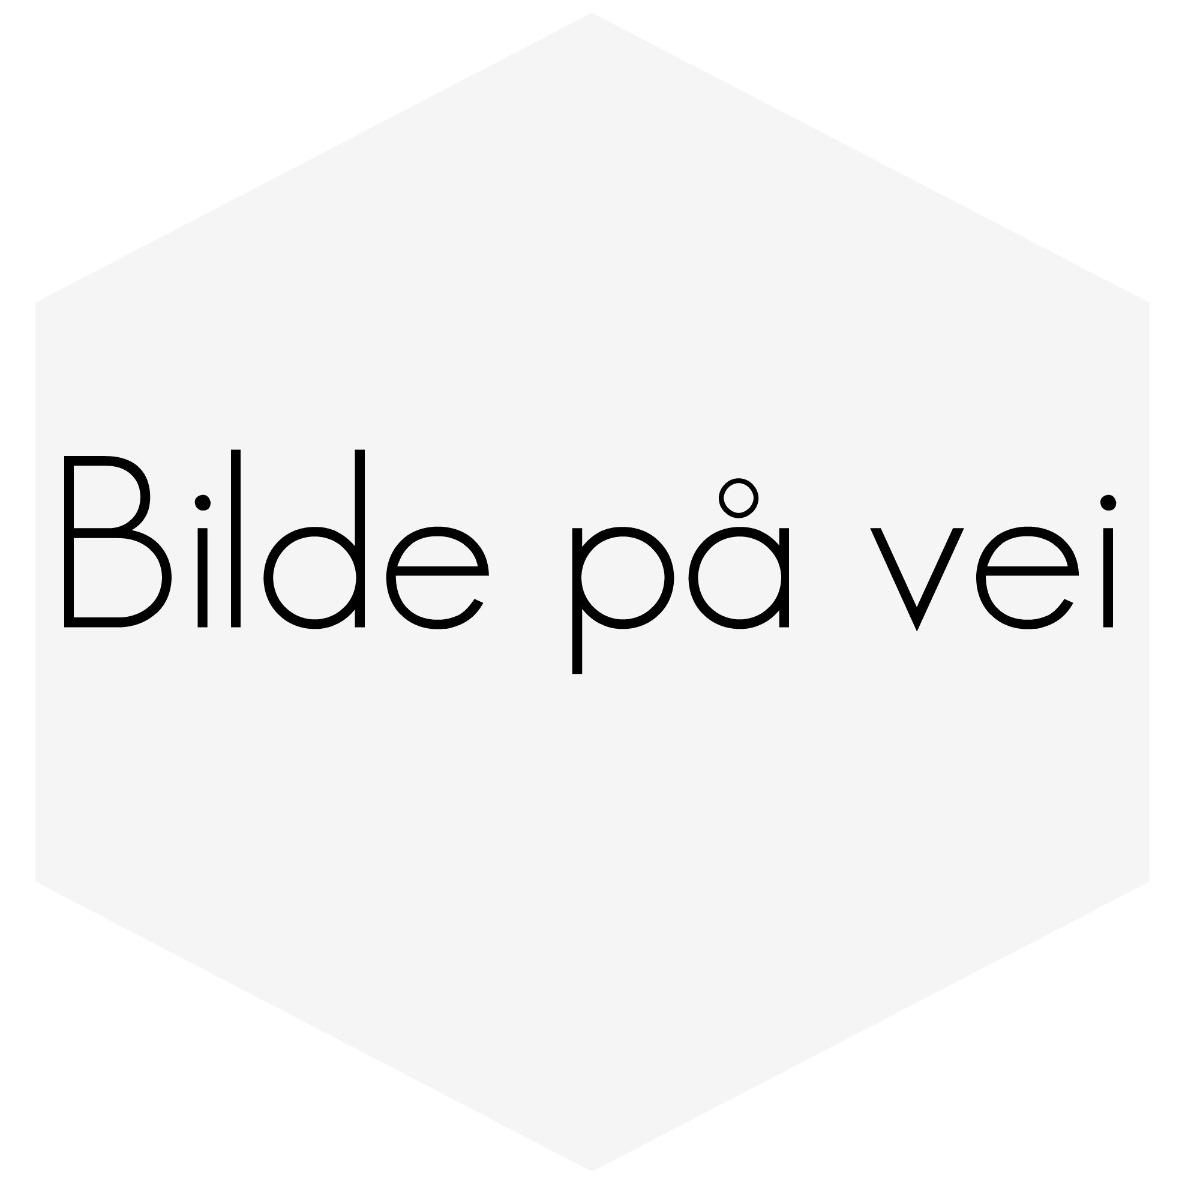 "SILIKONSLANGE DESIMETERVARE BLÅ 4,25"" (108MM)"